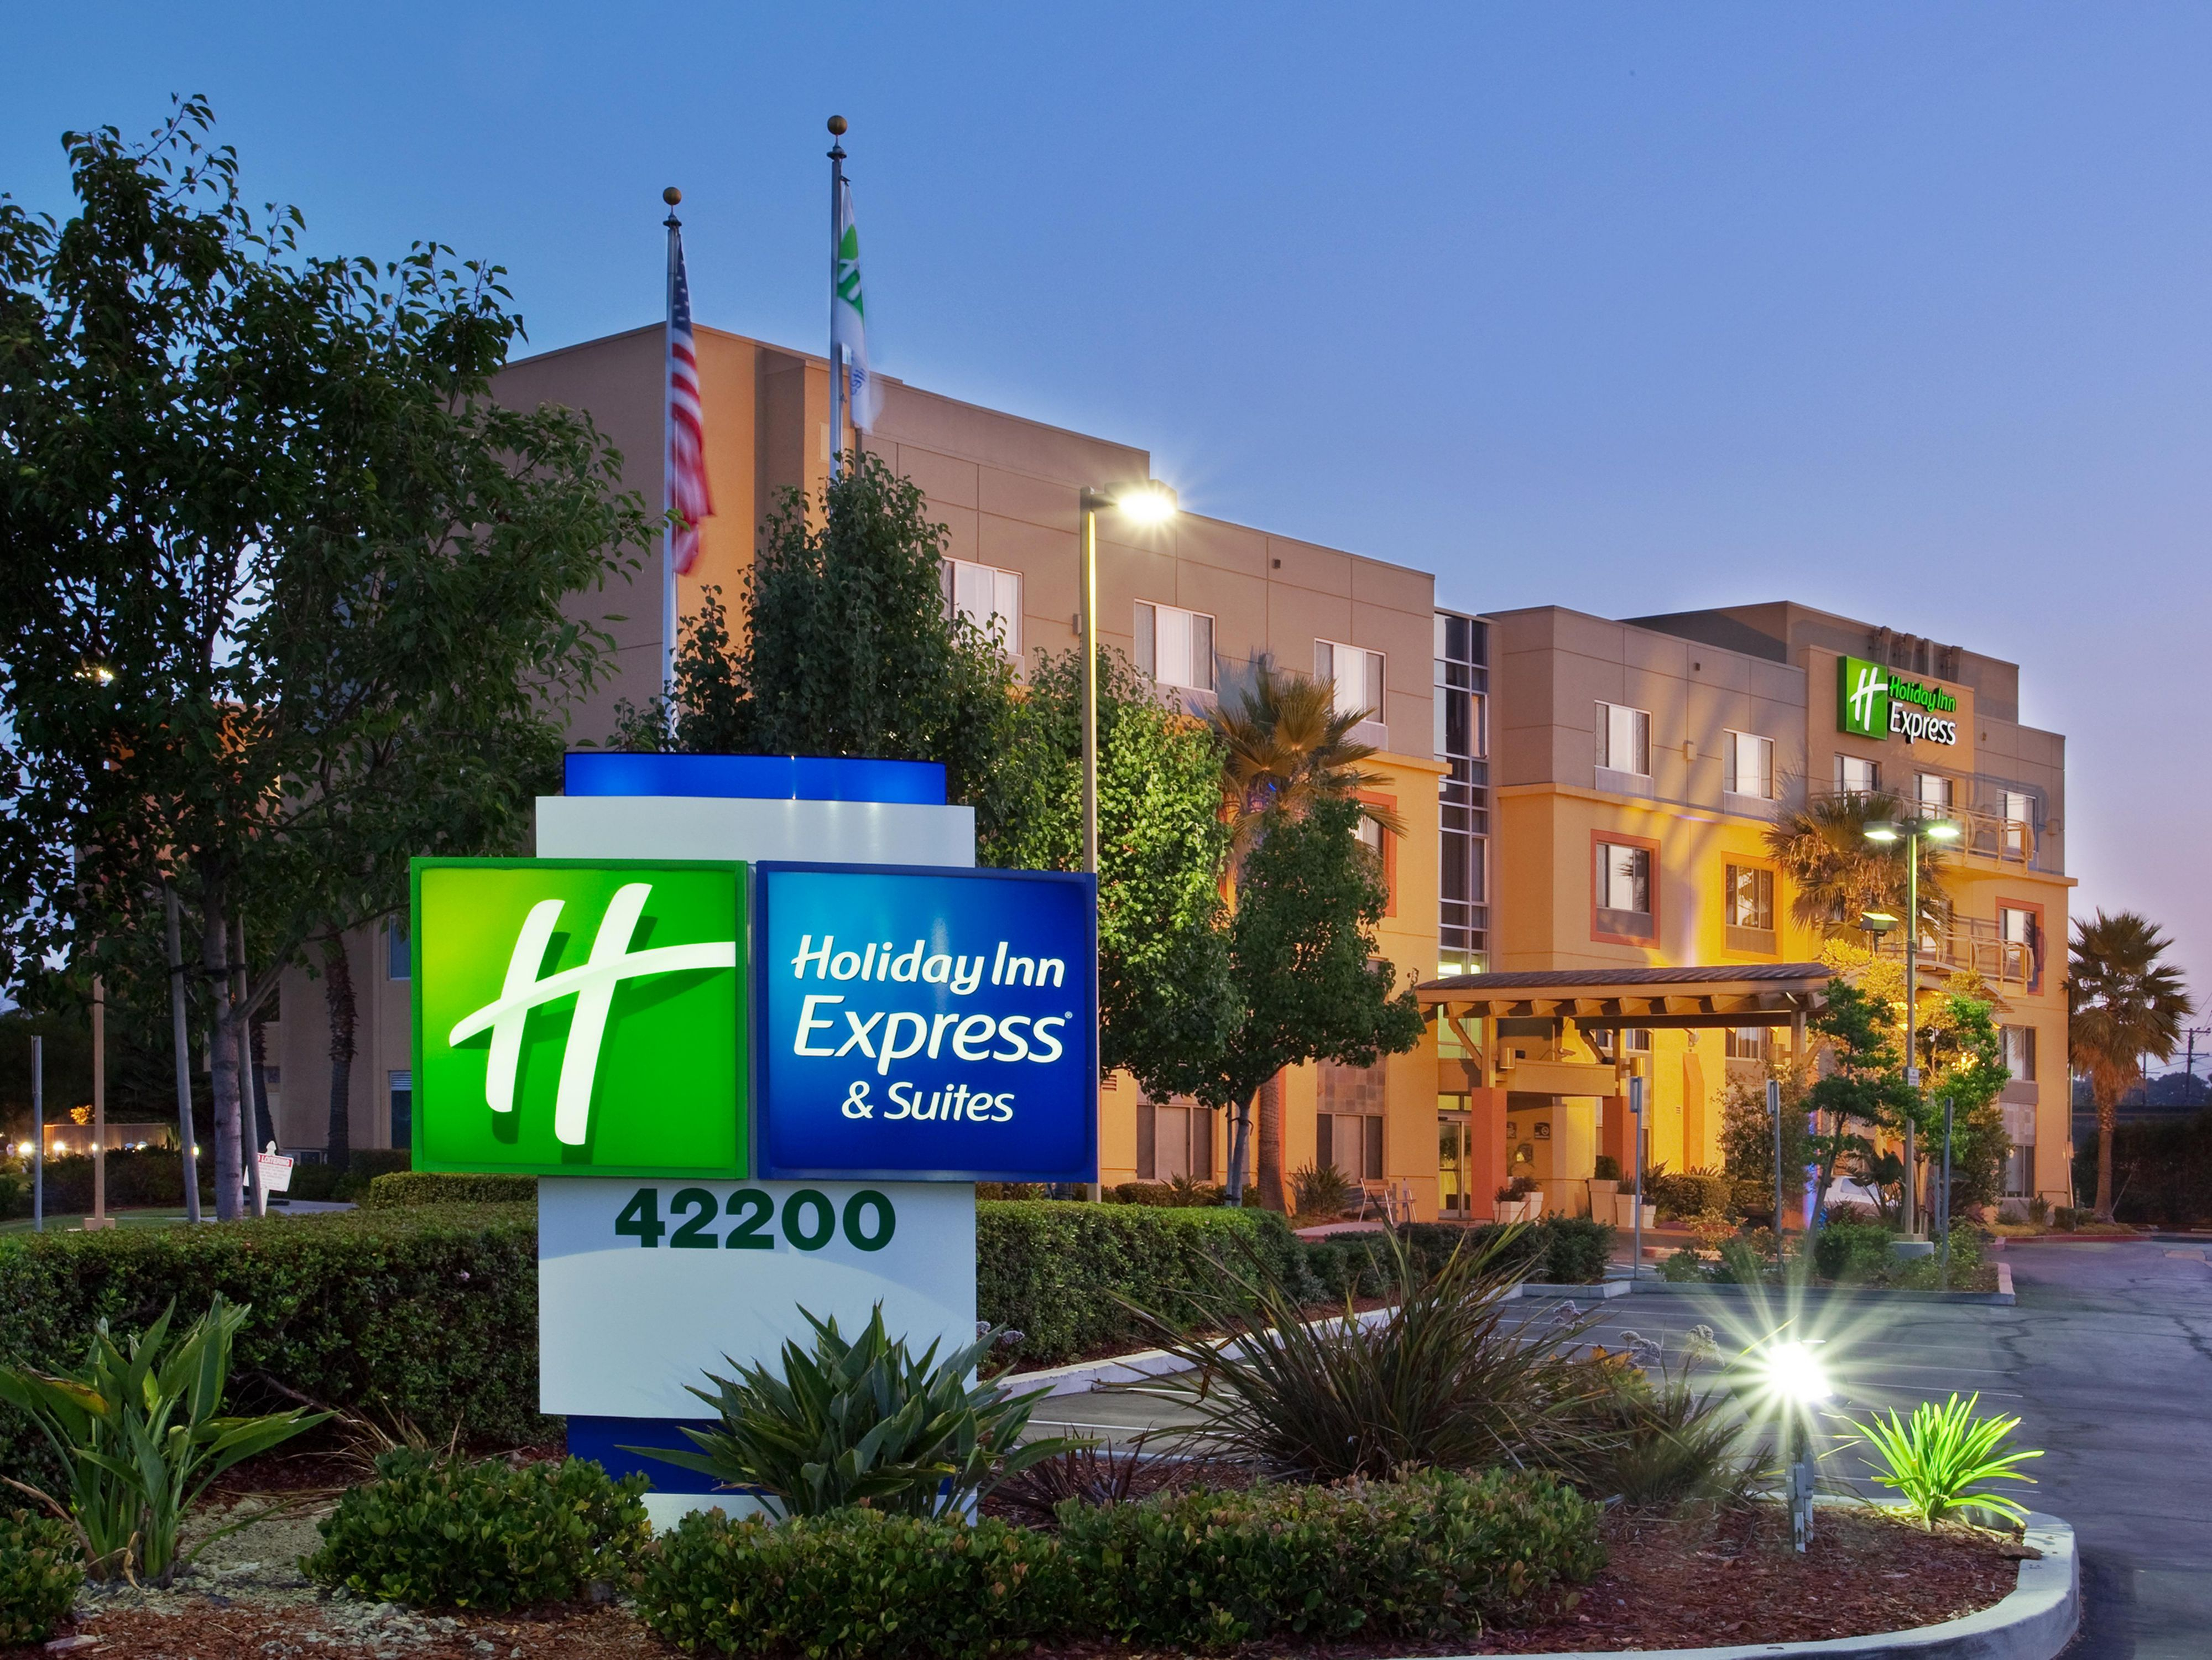 Holiday Inn Express California Locations Map - Klipy - Map Of Holiday Inn Express Locations In California